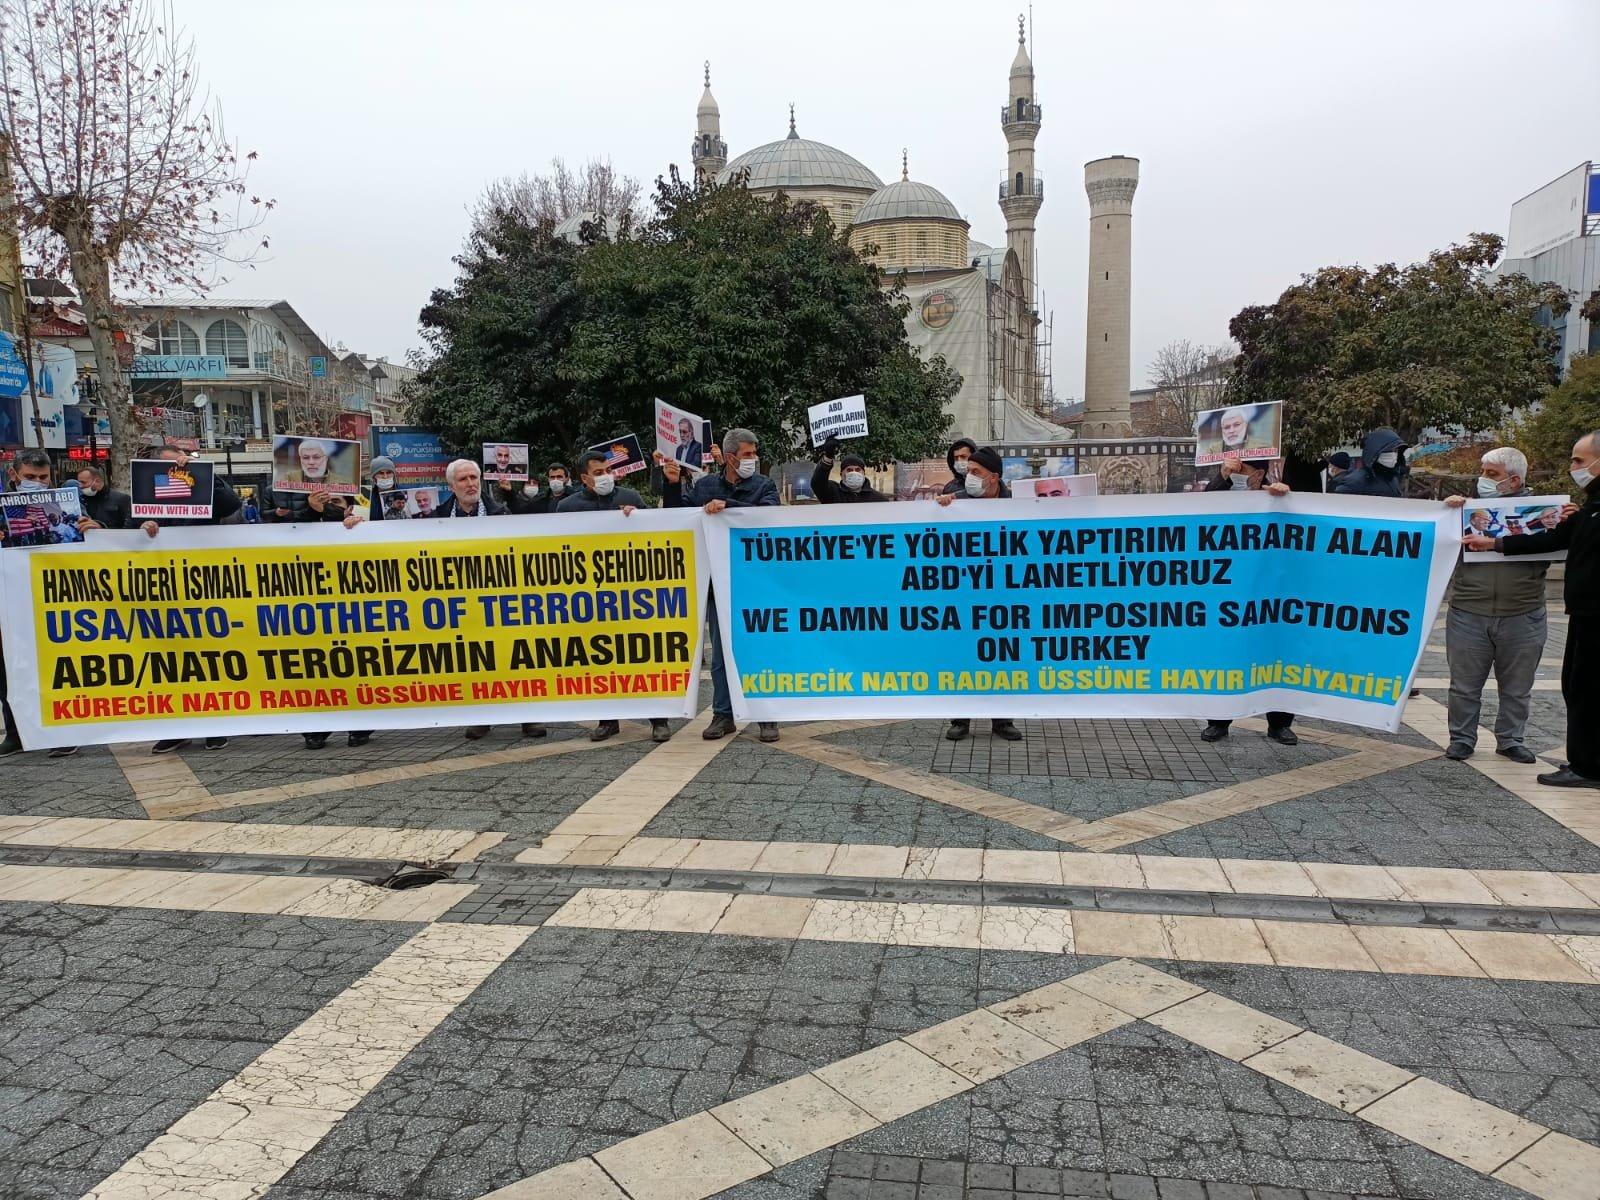 MALATYA'DA TERÖRİST NATO VE KATİL ABD PROTESTO EDİLDİ/KUDÜS ŞEHİTLERİ ANILDI (VİDEO-FOTO)